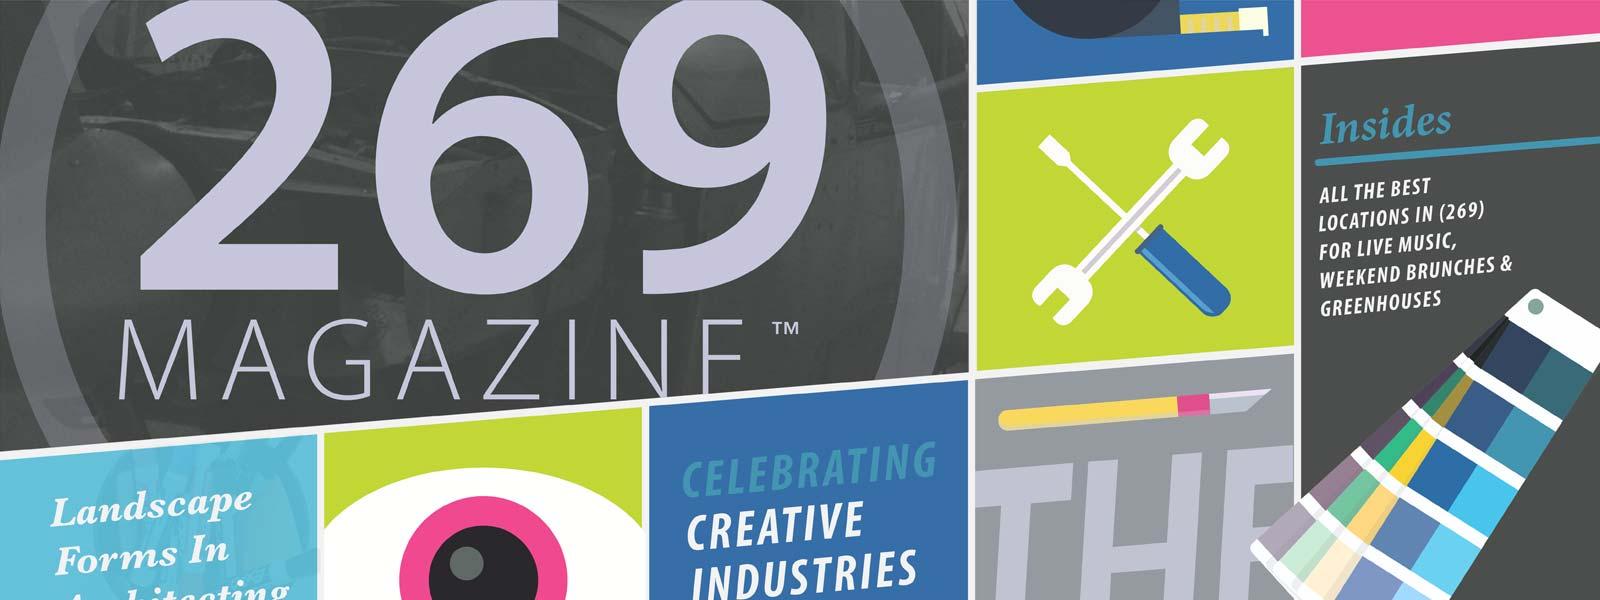 269 Magazine cover